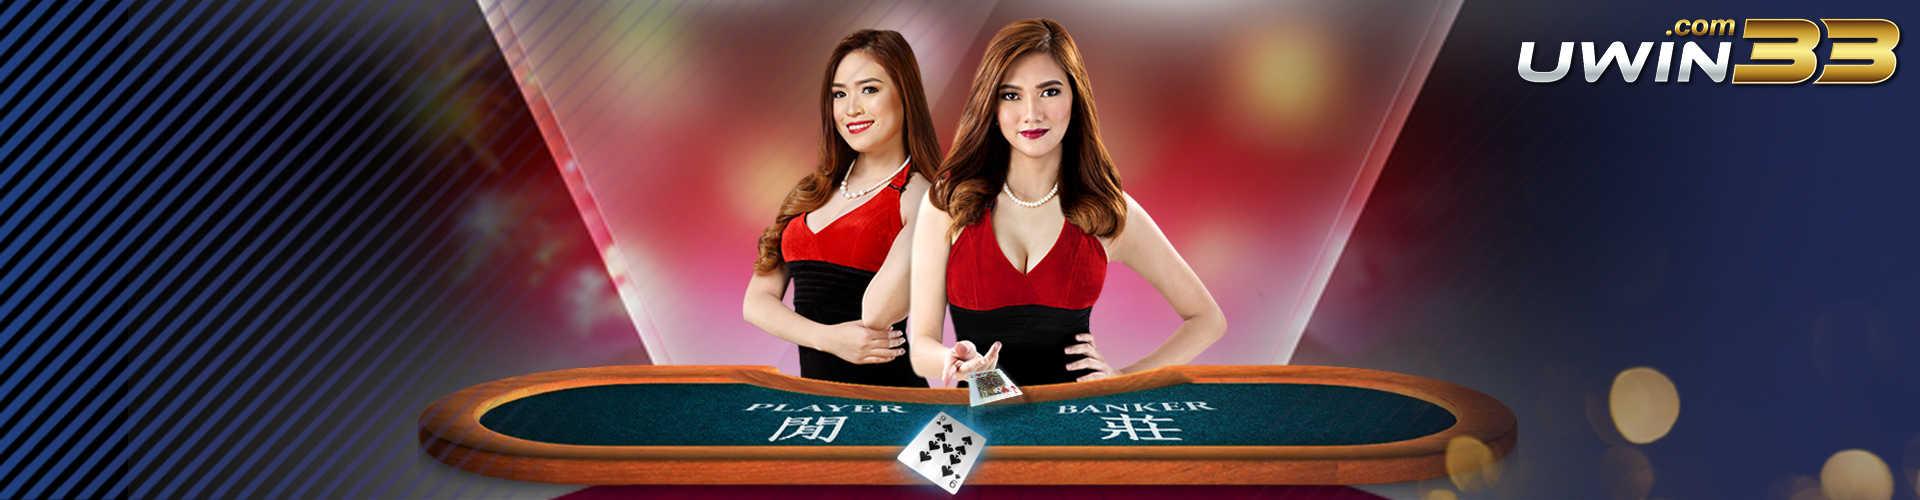 Uwin33 Your Choice of Online Casino